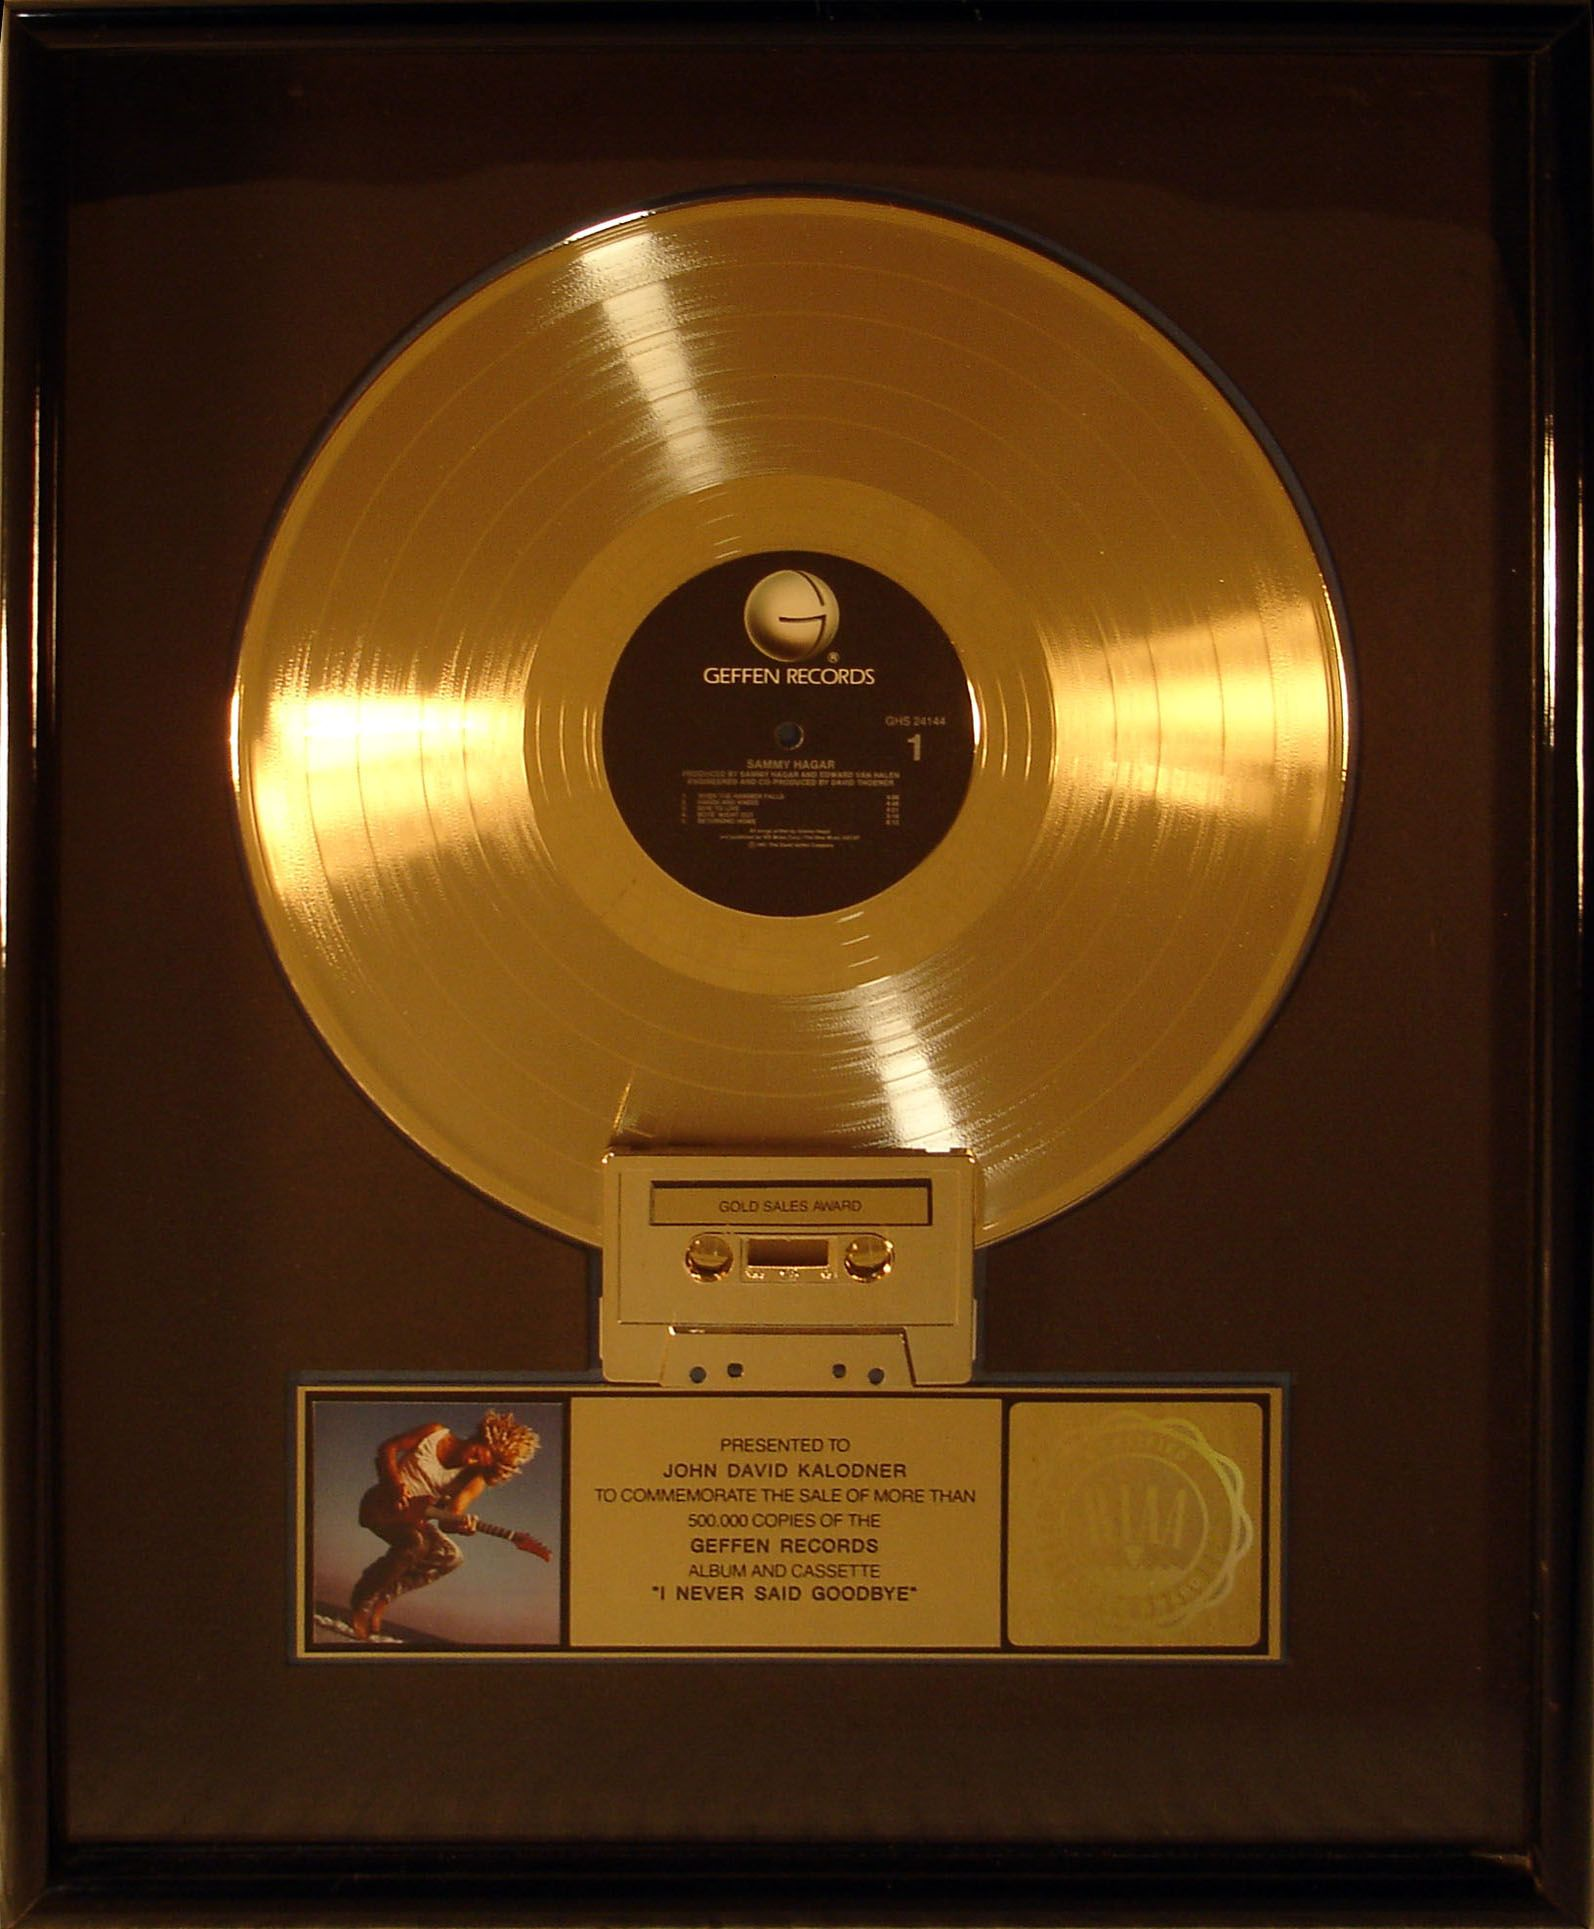 Gold Record Award Presented To Jdk For Sammy Hagar S Album I Never Said Goodbye Reo Speedwagon Records Recording Artists